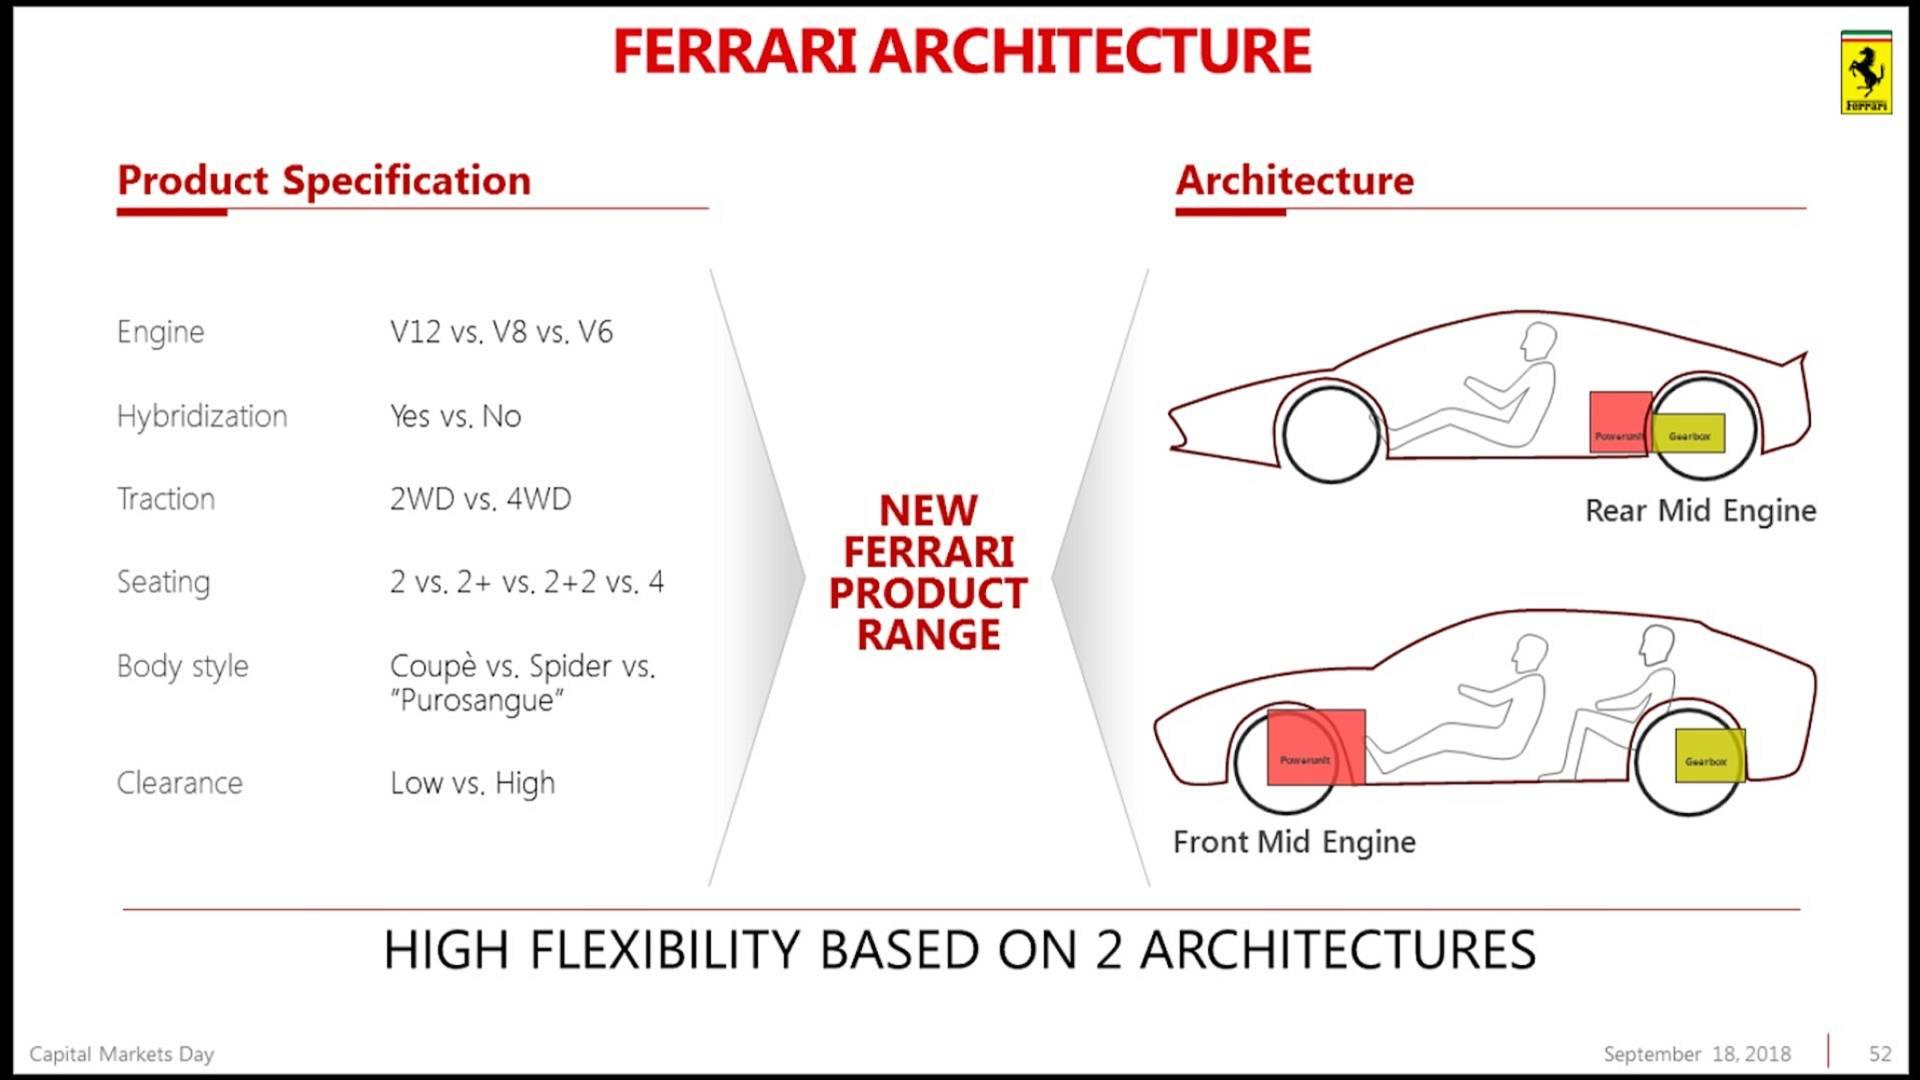 Piano Industriale Ferrari 2018-2022 (43)